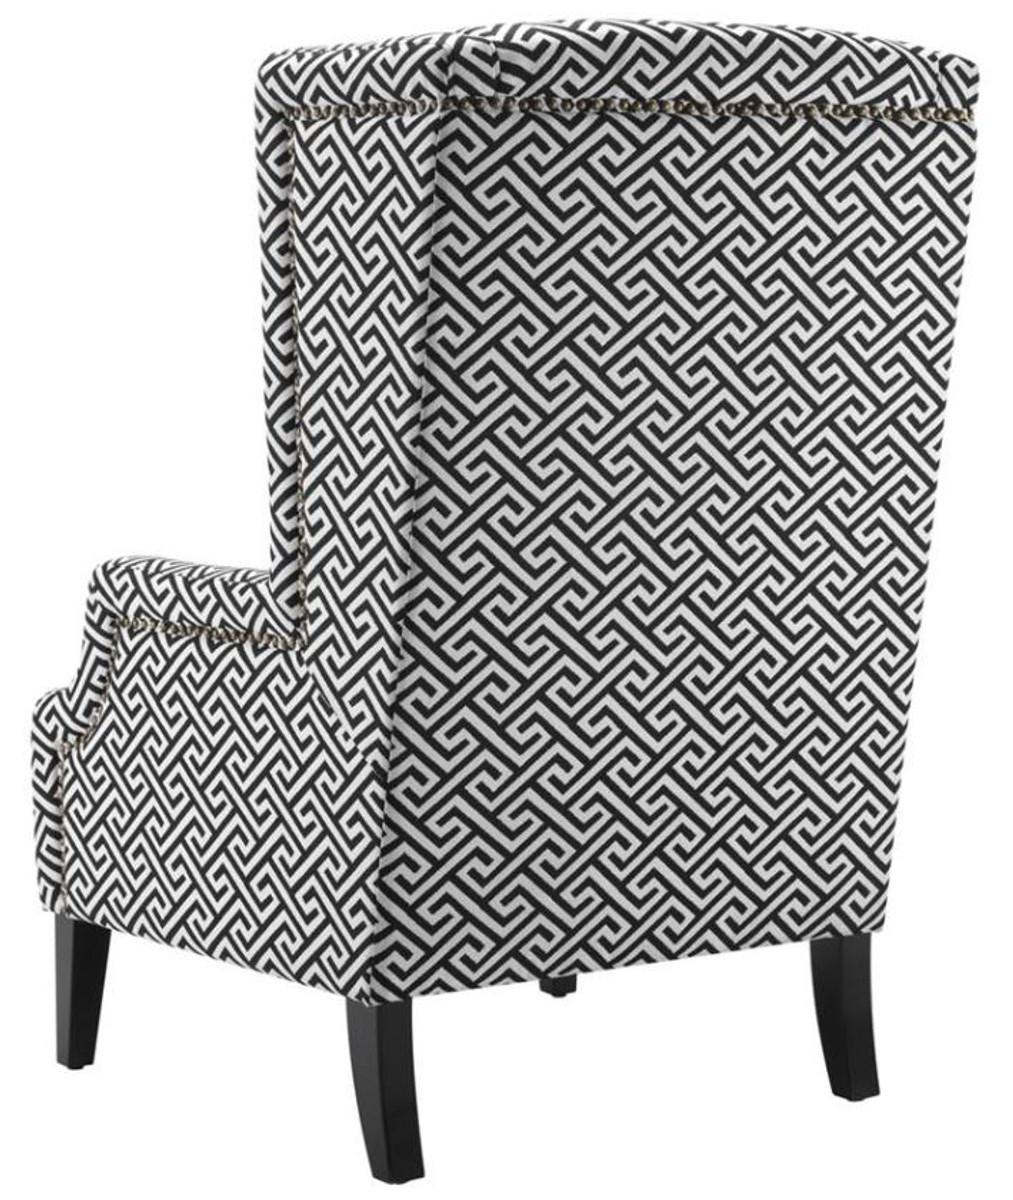 Designer Ohrensessel. Simple Free Sessel With Ohrensessel Design ...